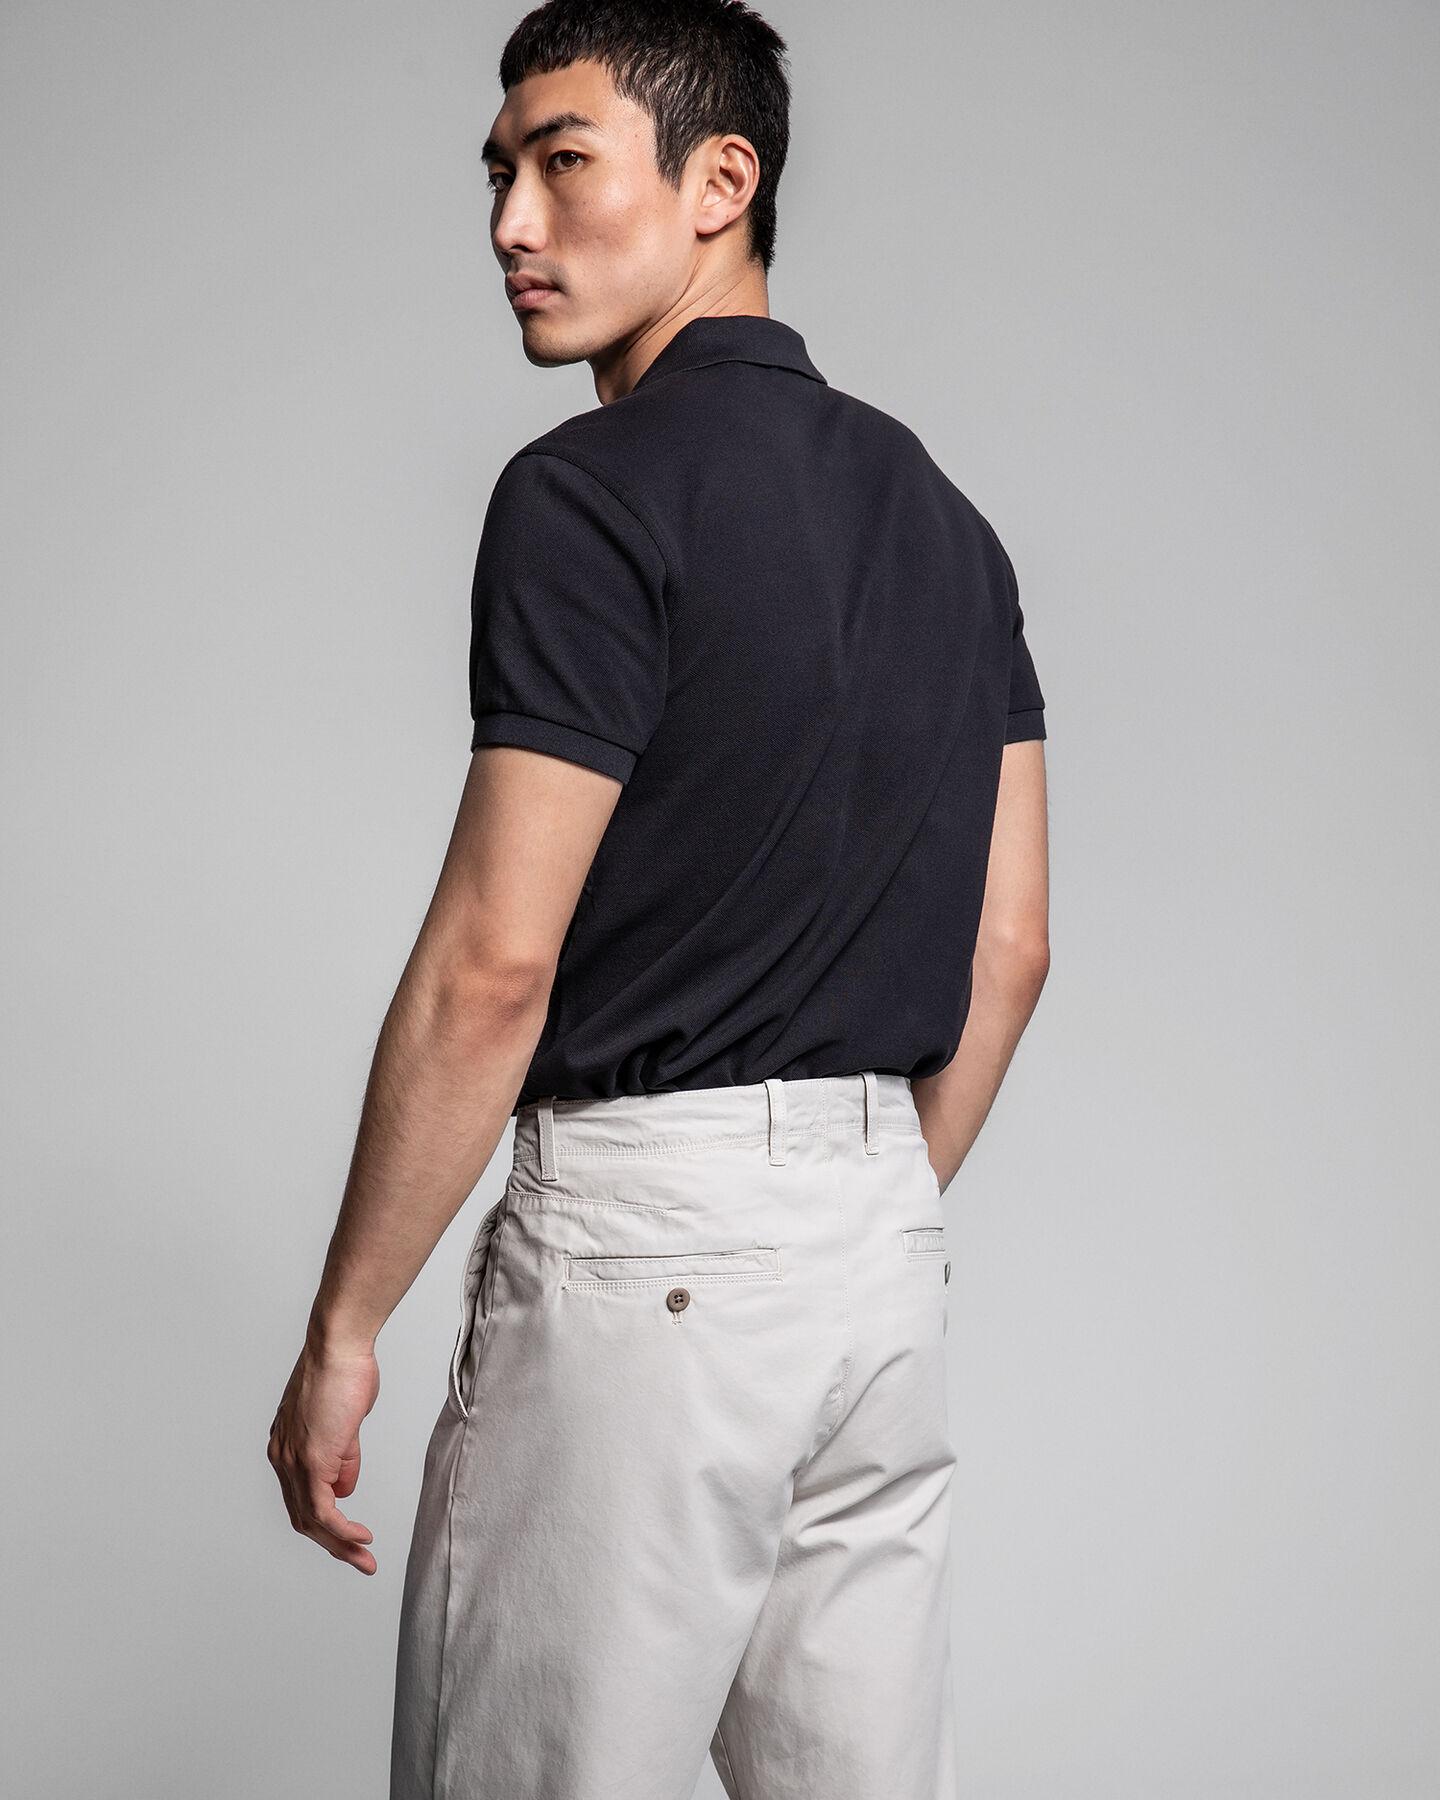 Original Slim Fit Piqué Poloshirt